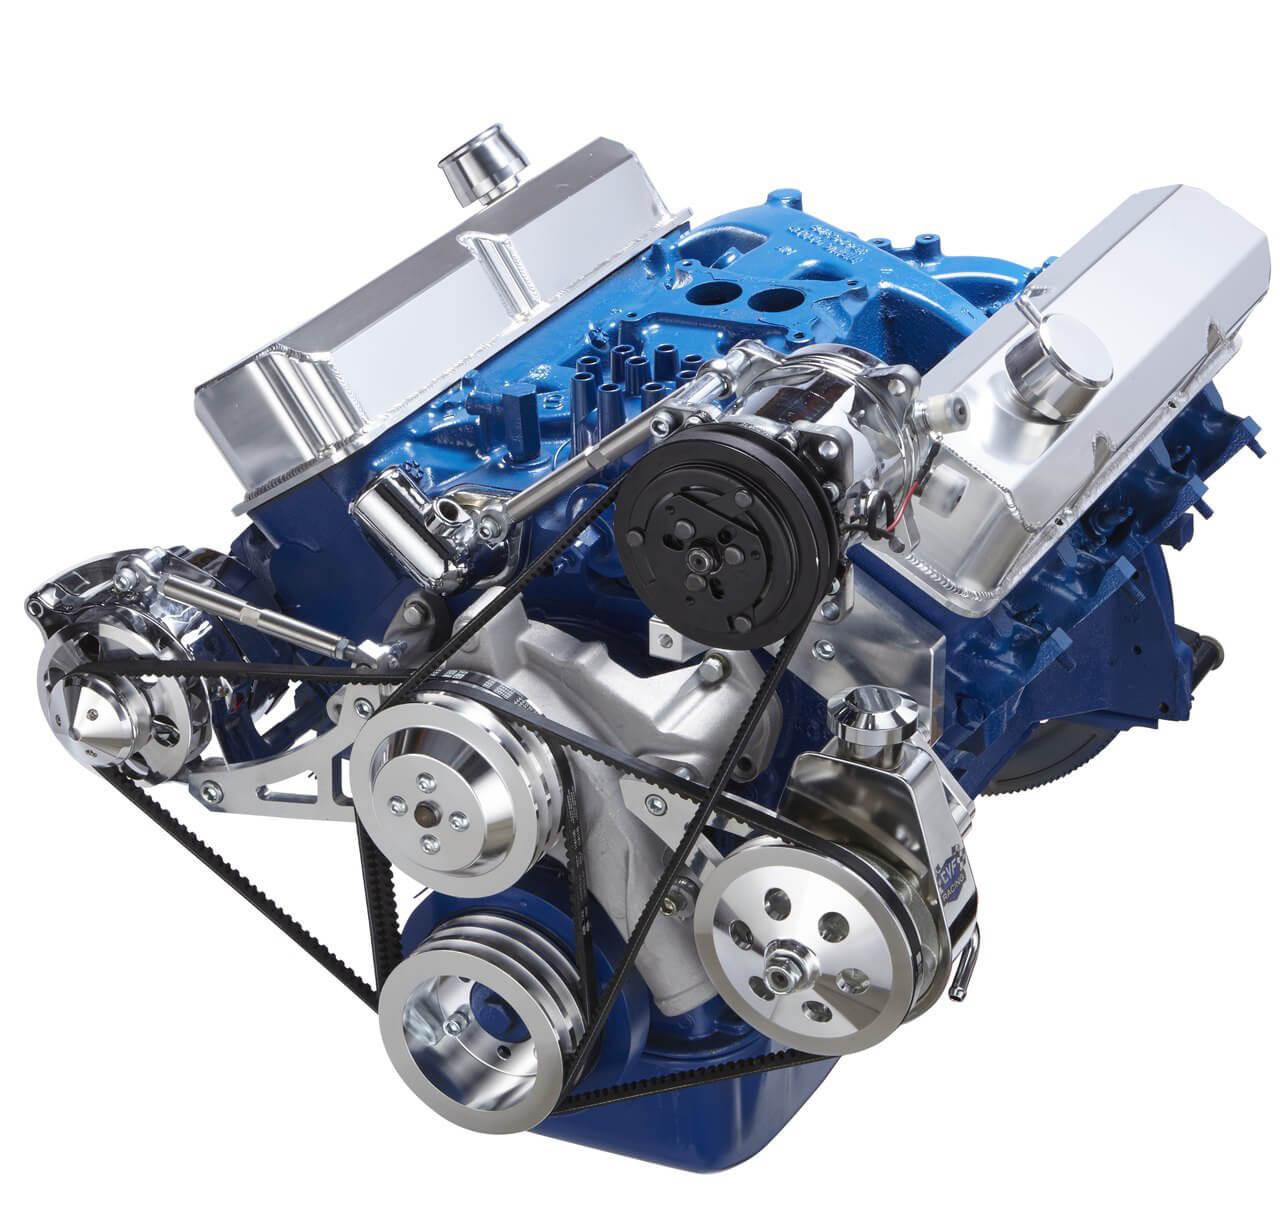 hight resolution of fe 390 engine diagrams on diagram data schemaford 390 fe engine v belt pulley system sanden